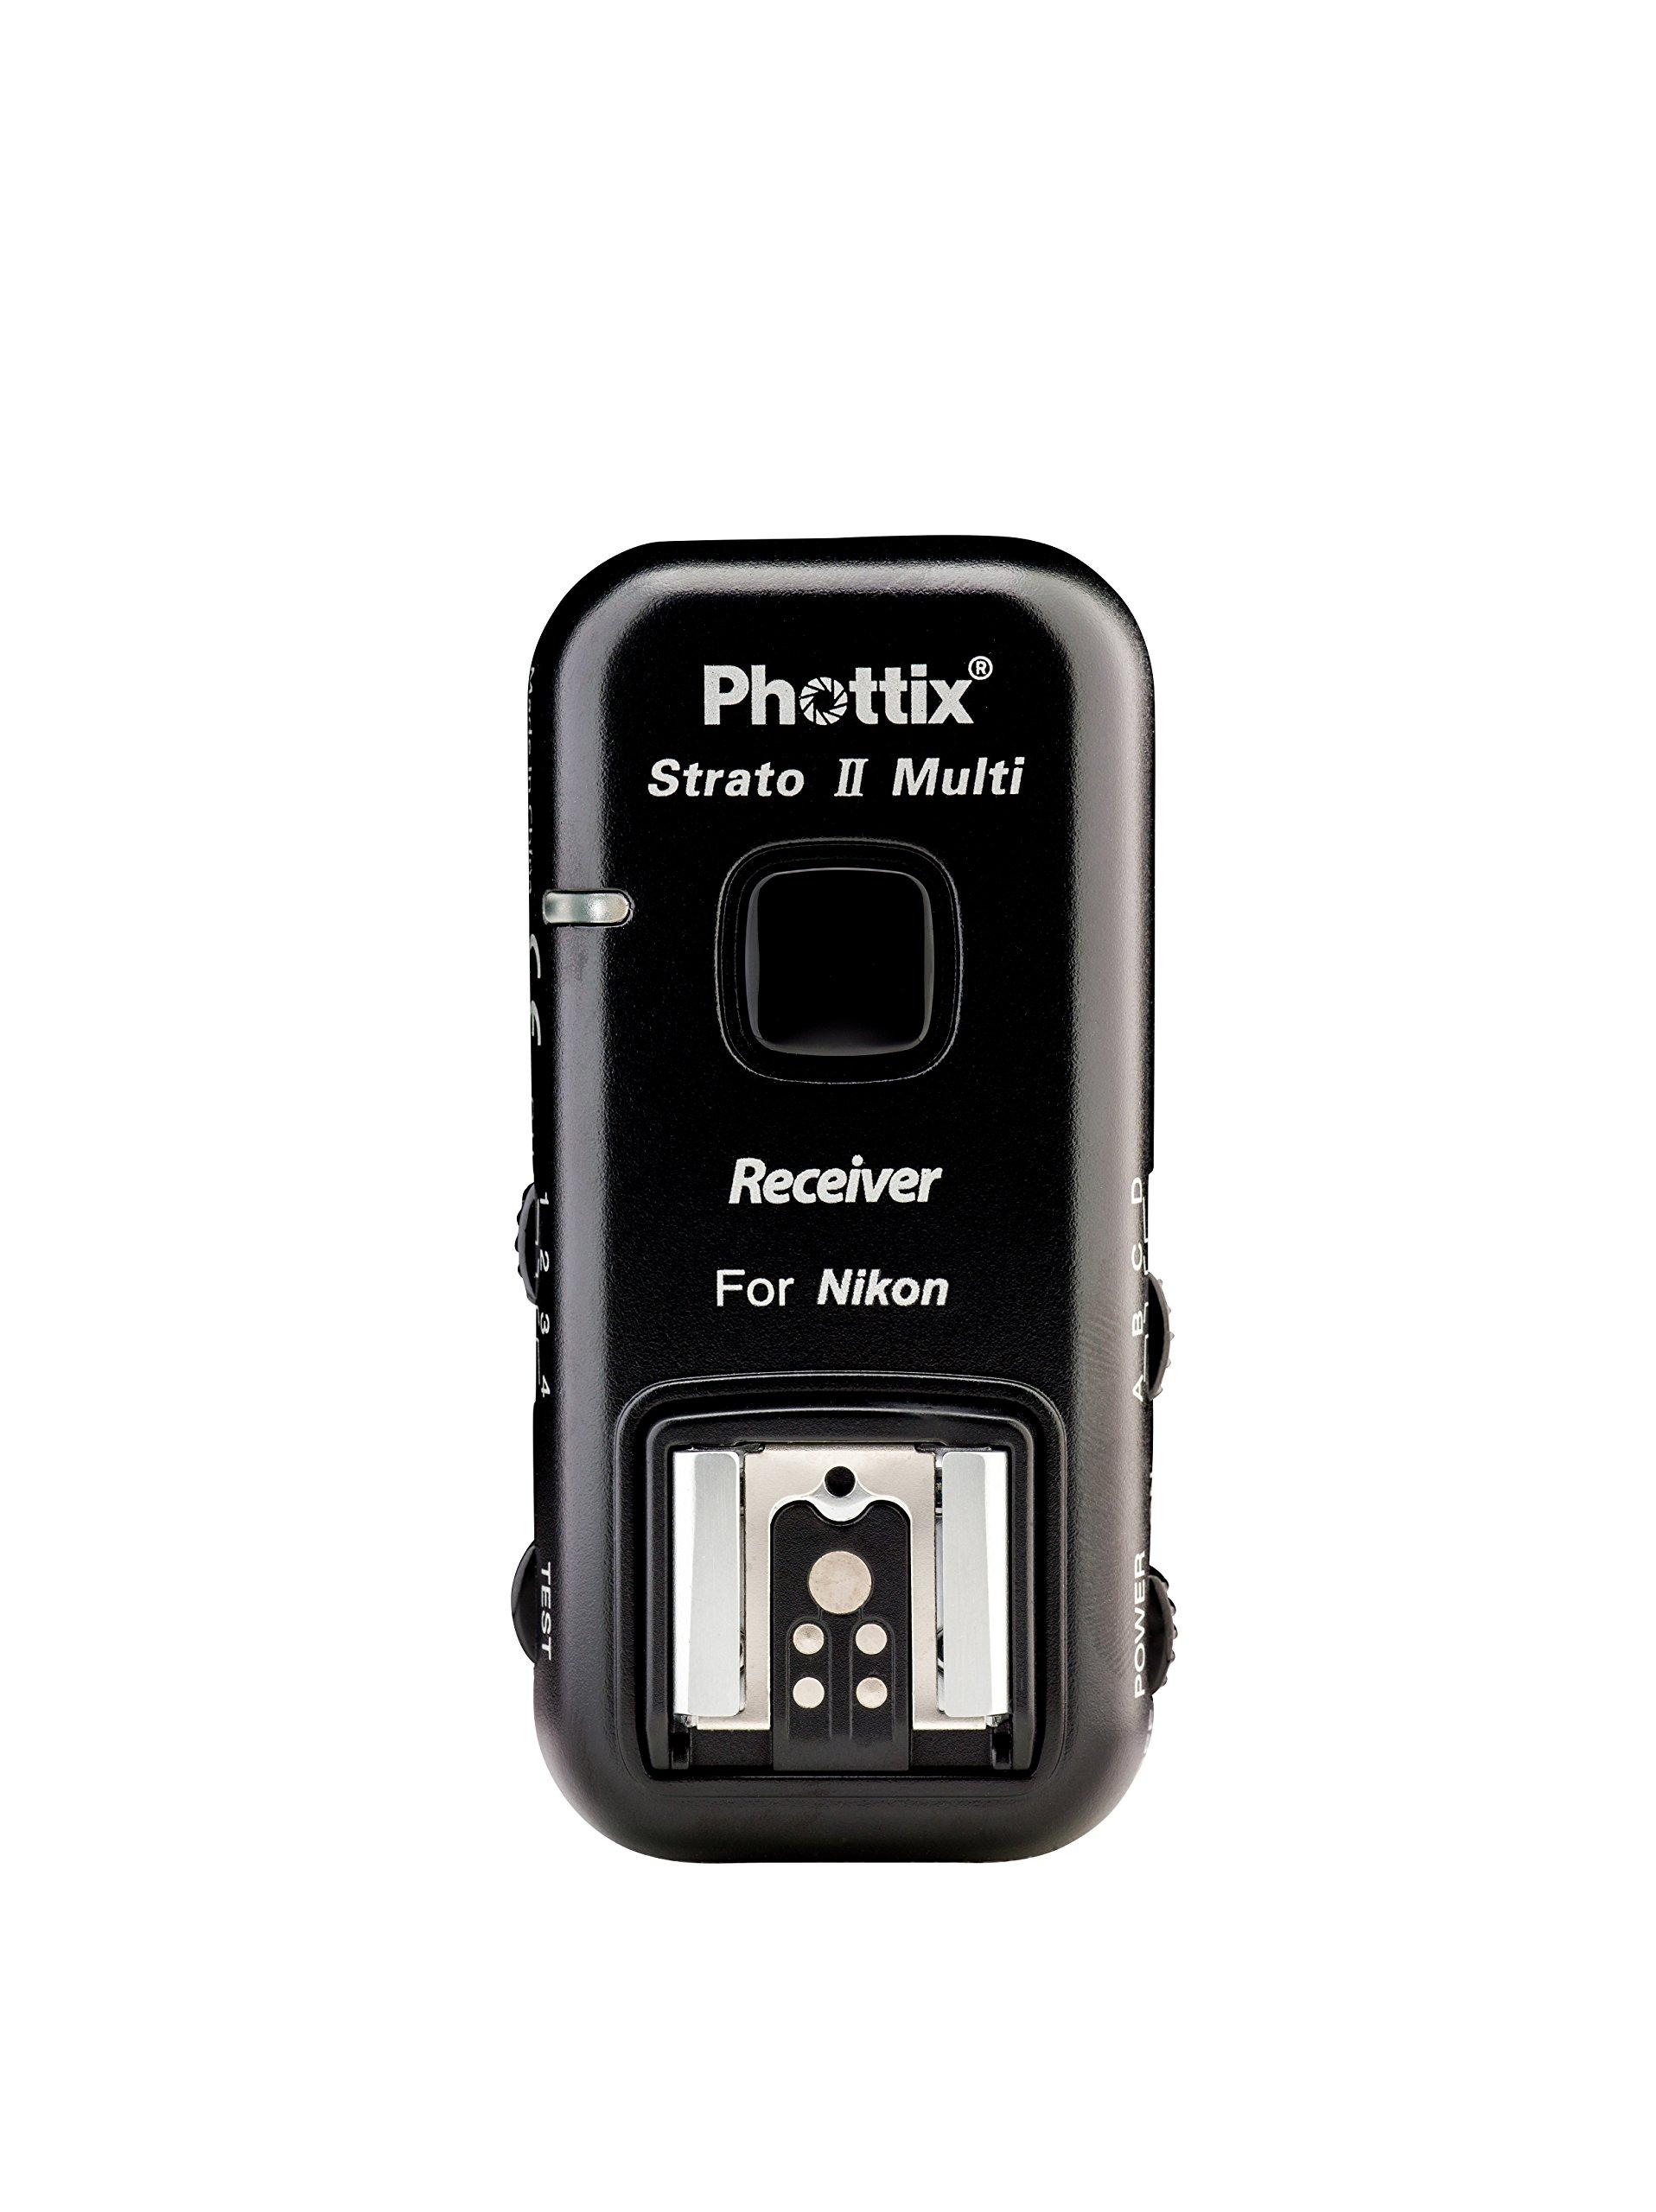 Phottix Stratos II Multi 5-In-1 Nikon Receiver by Phottix